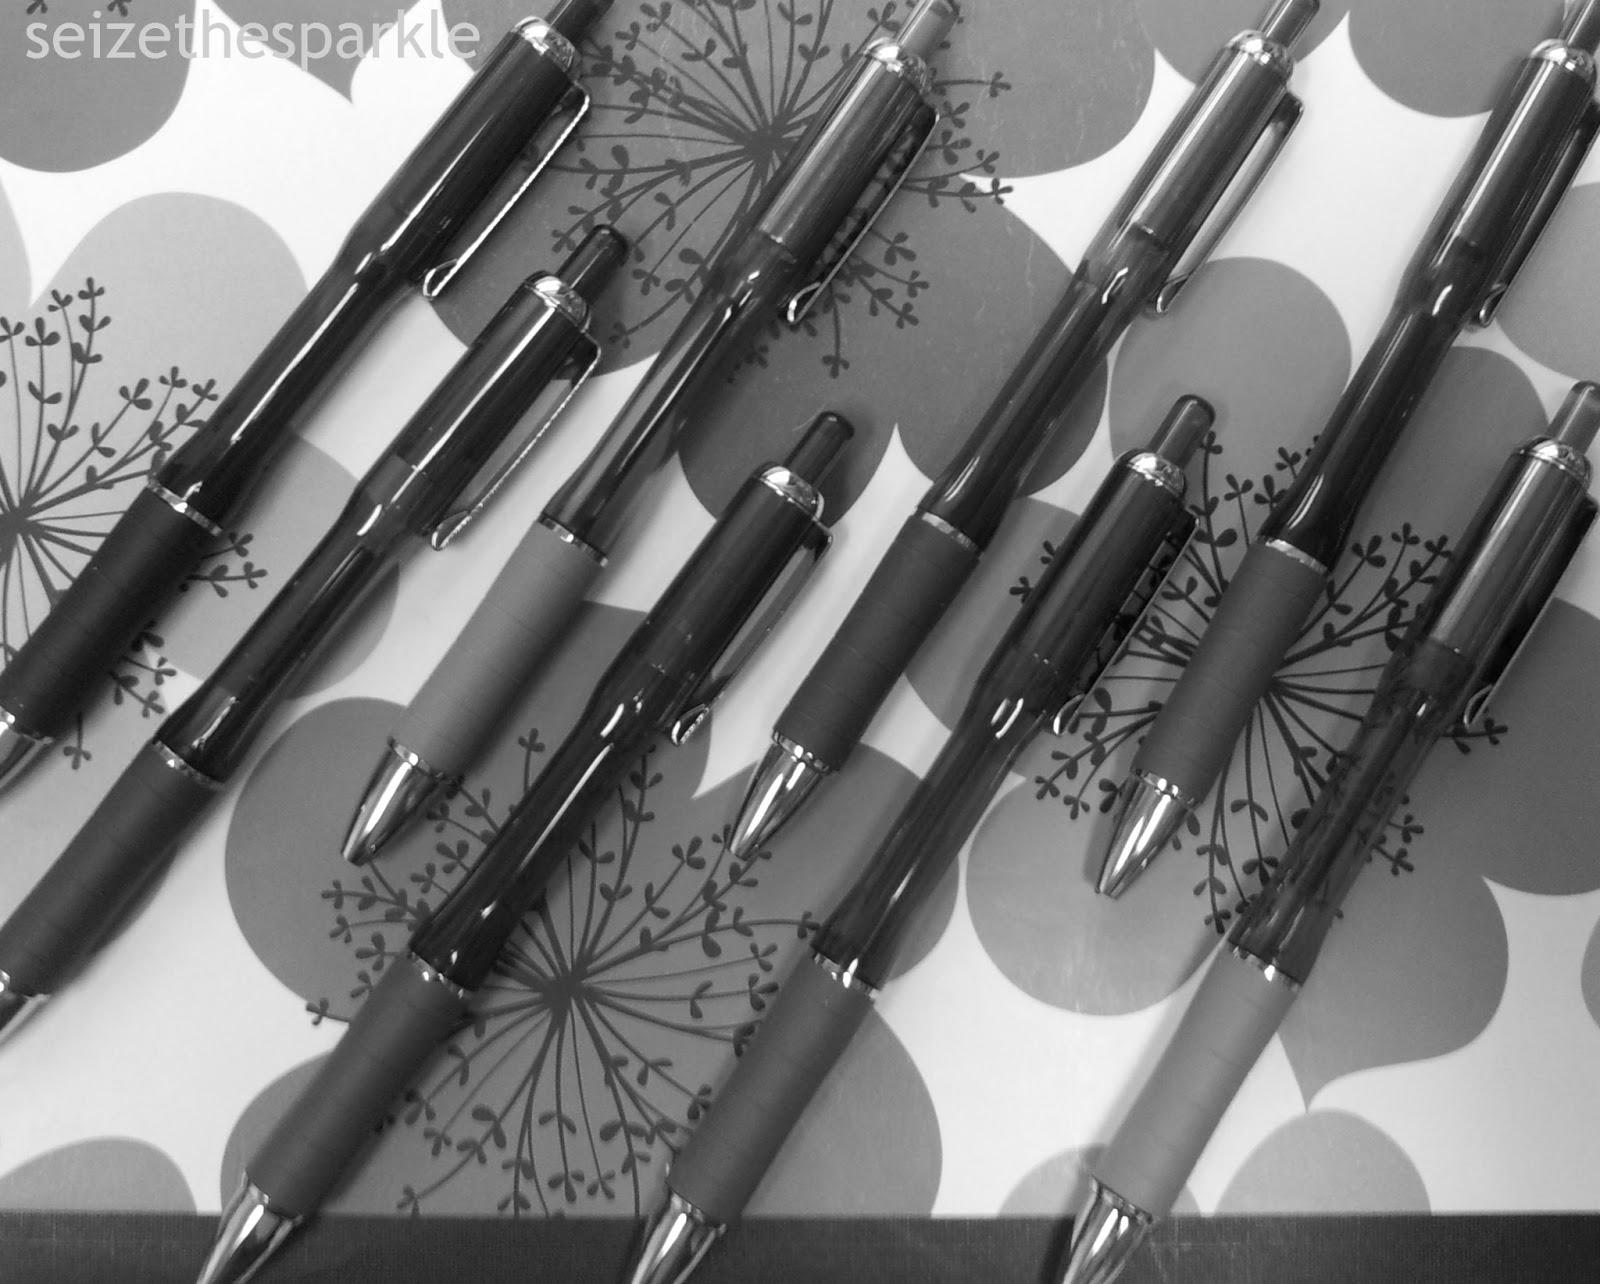 PaperMate Profile Elite Pens